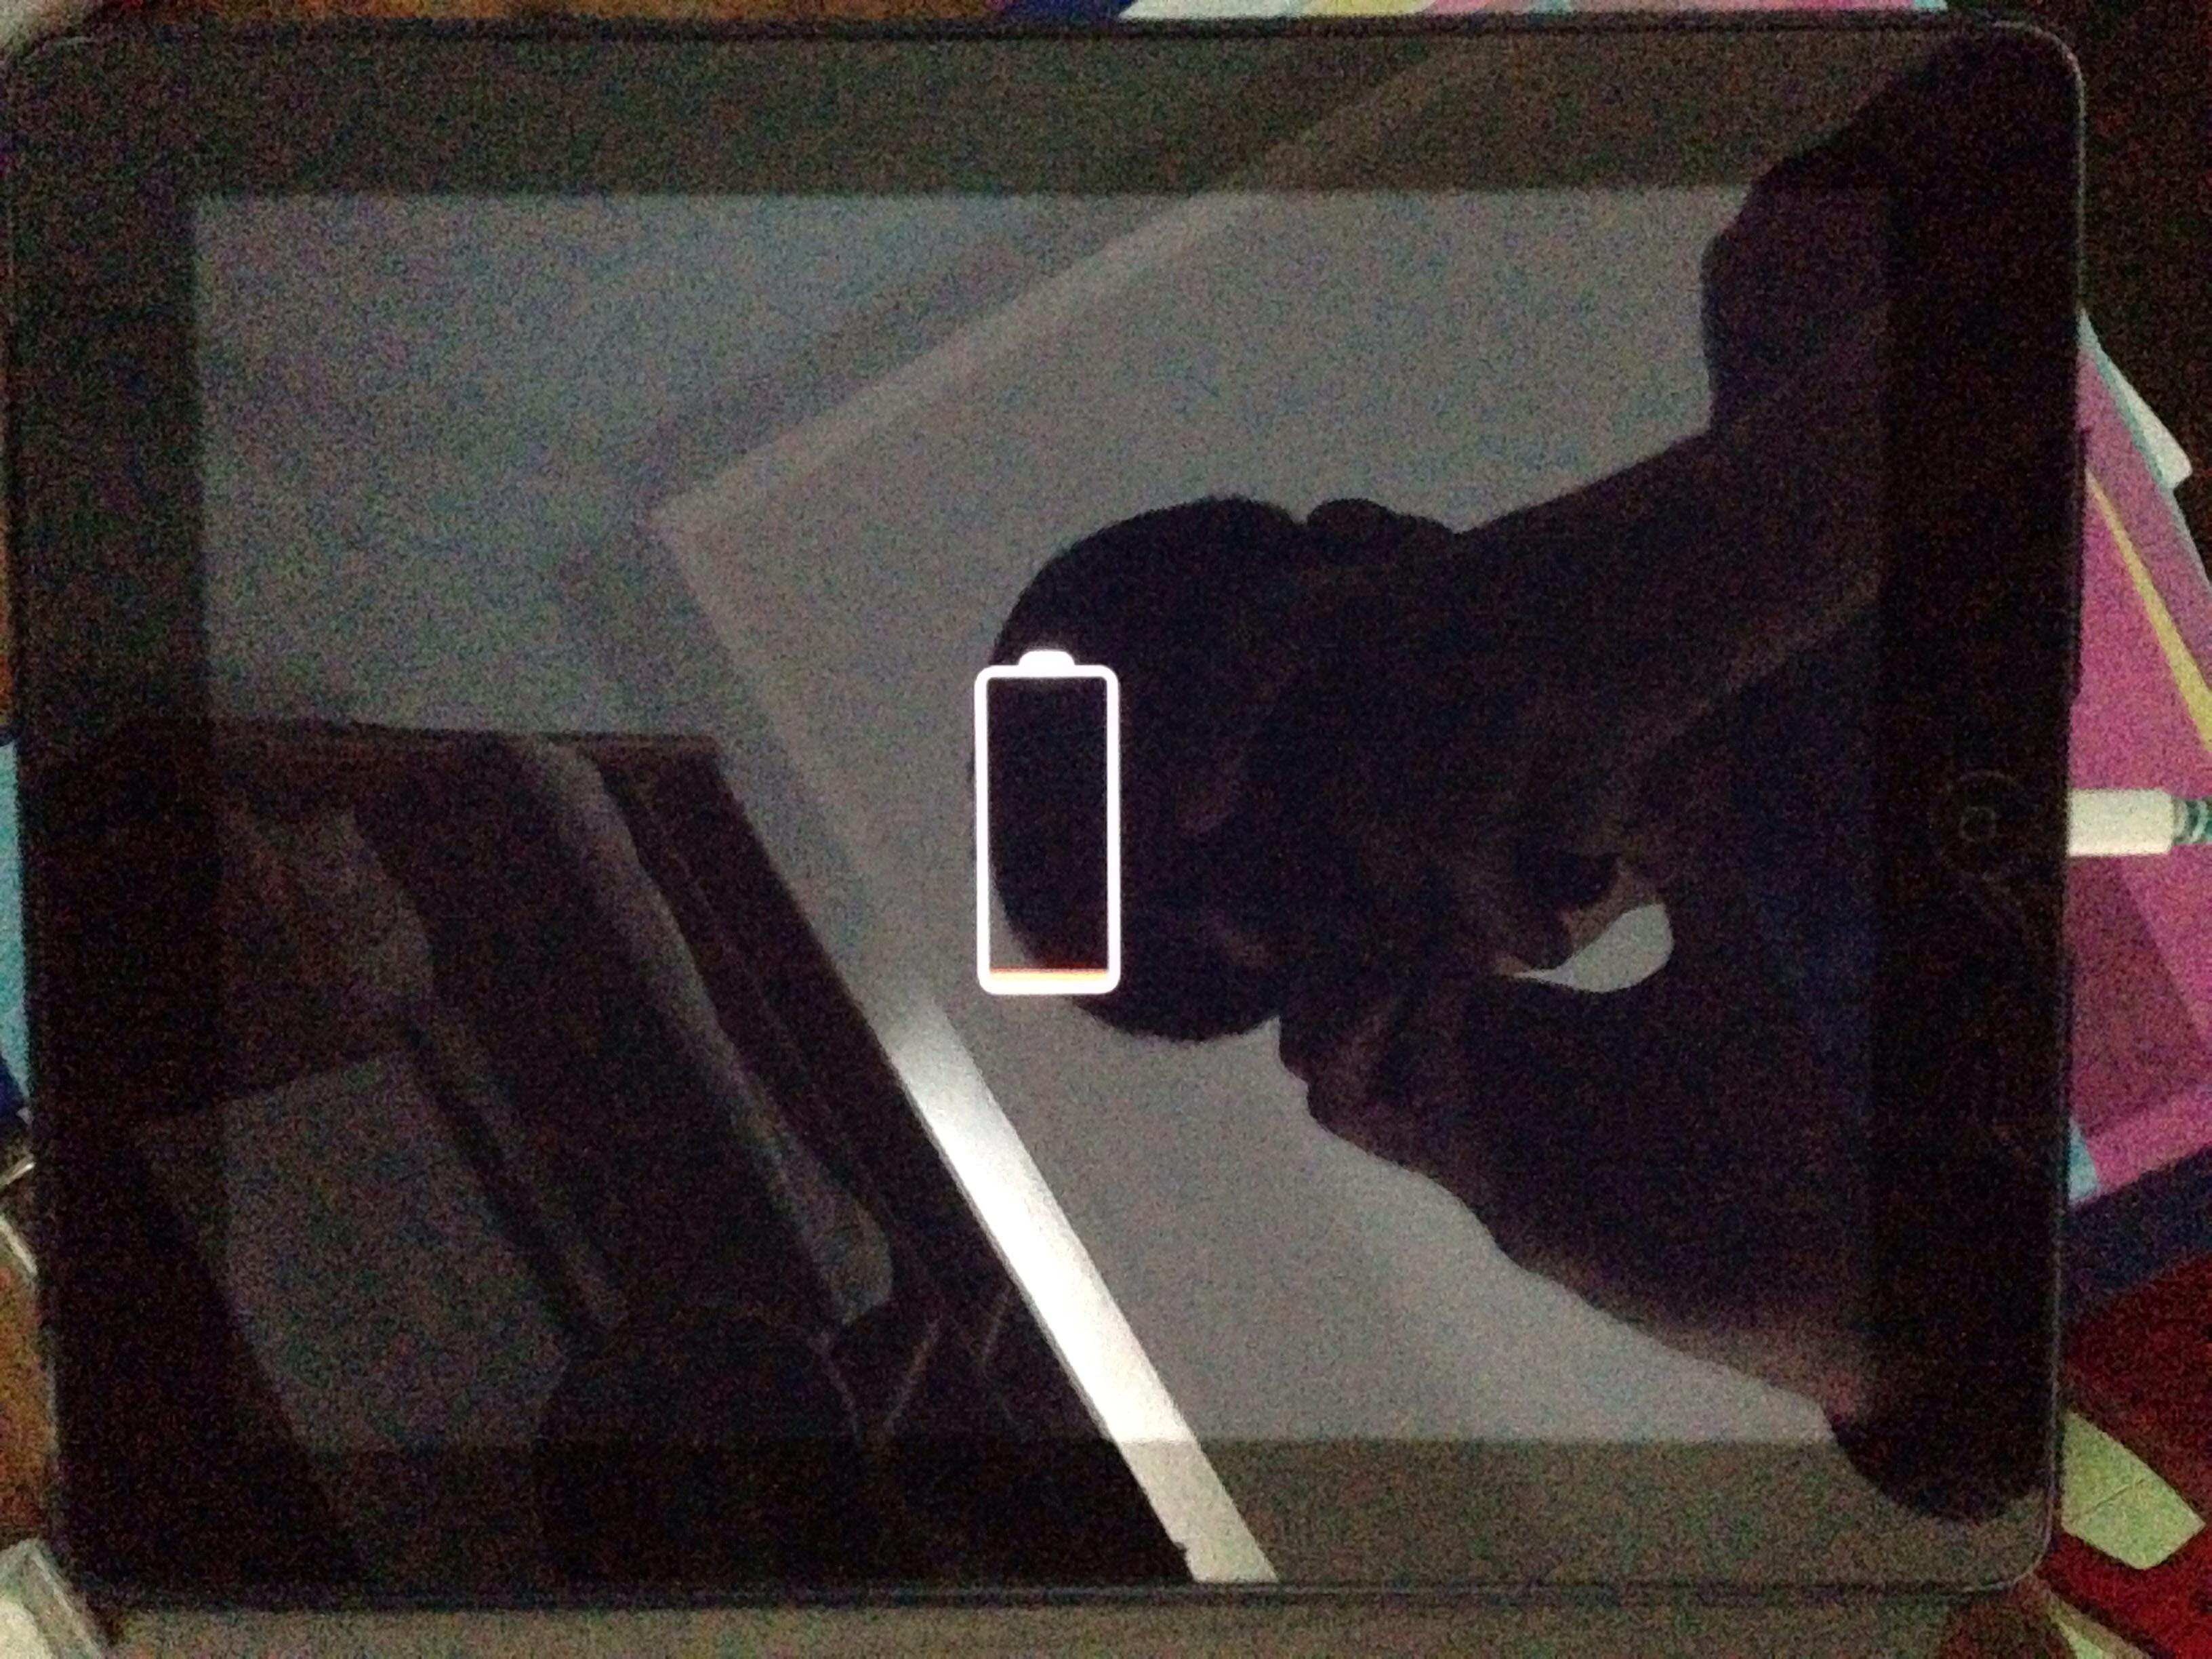 My ipad 4 stucks on red battery symbol an… - Apple Community